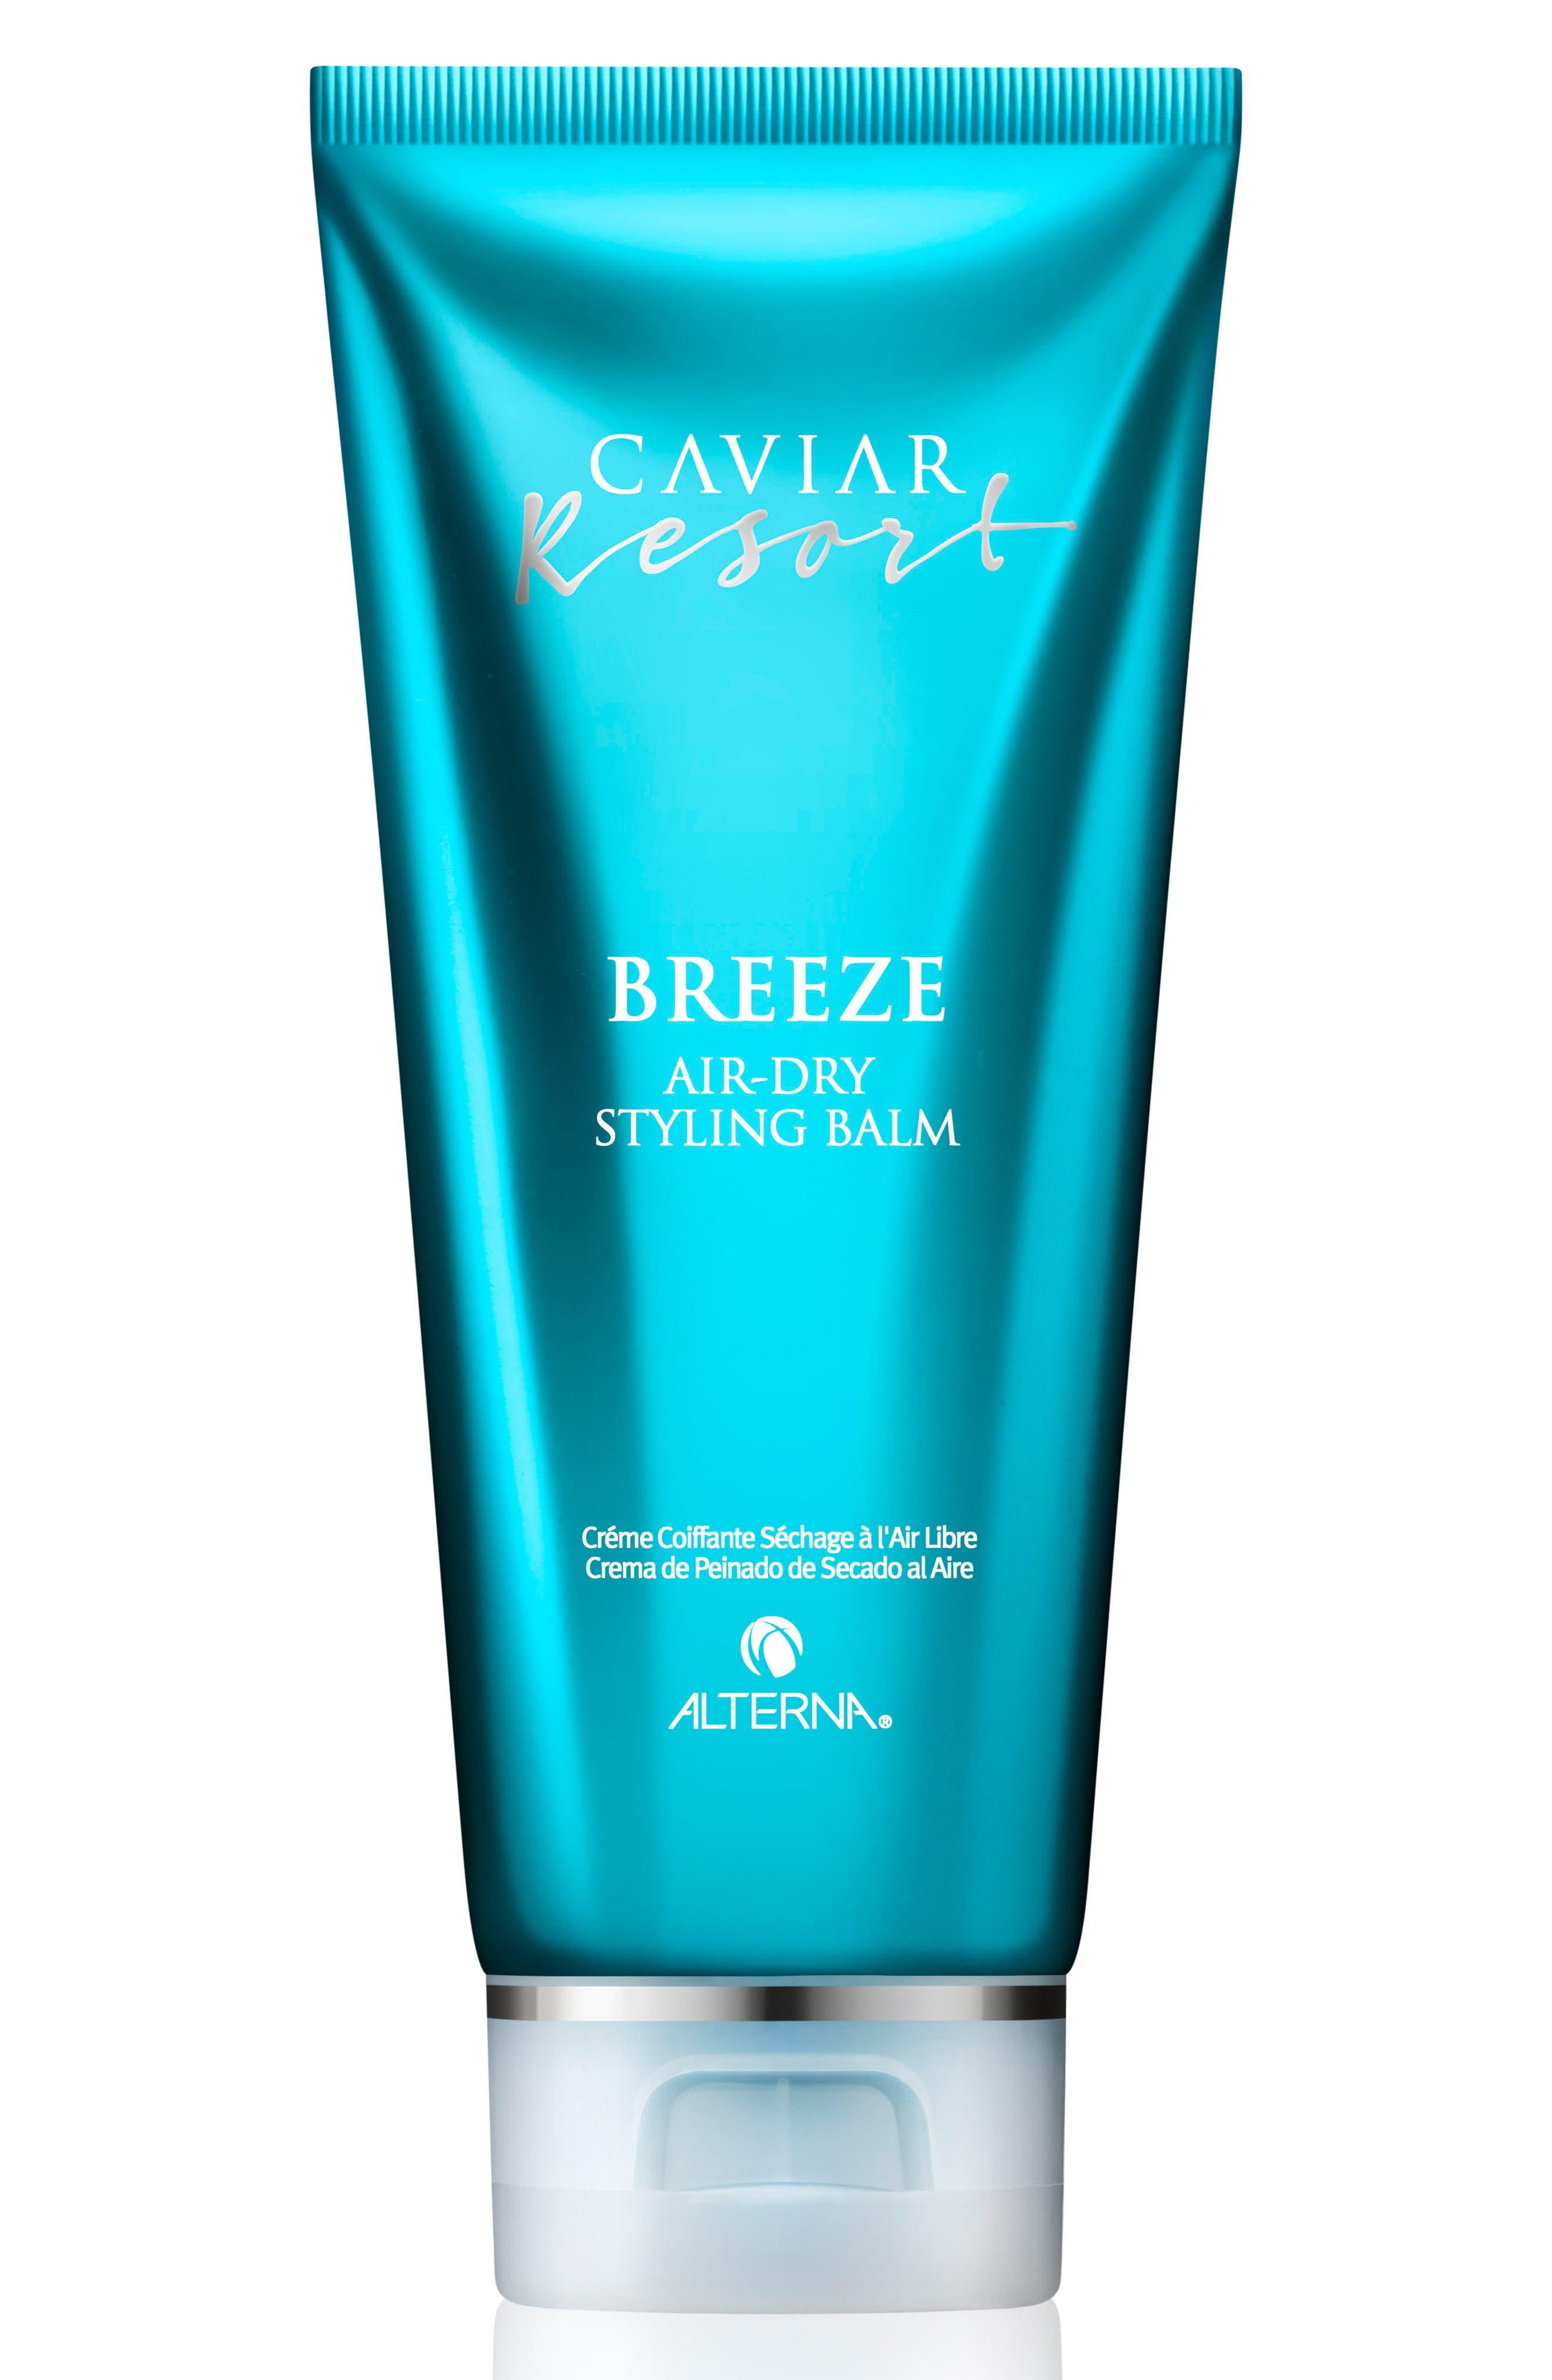 Caviar Resort Breeze Air-Dry Styling Balm,                             Main thumbnail 1, color,                             000